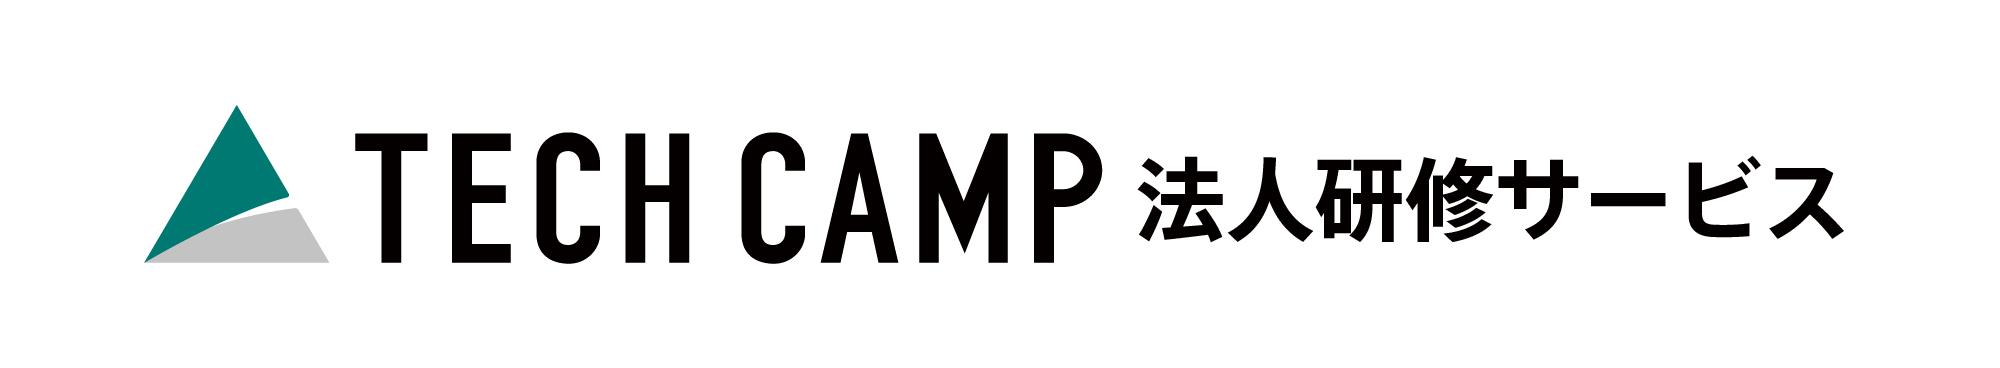 tech-camp-training